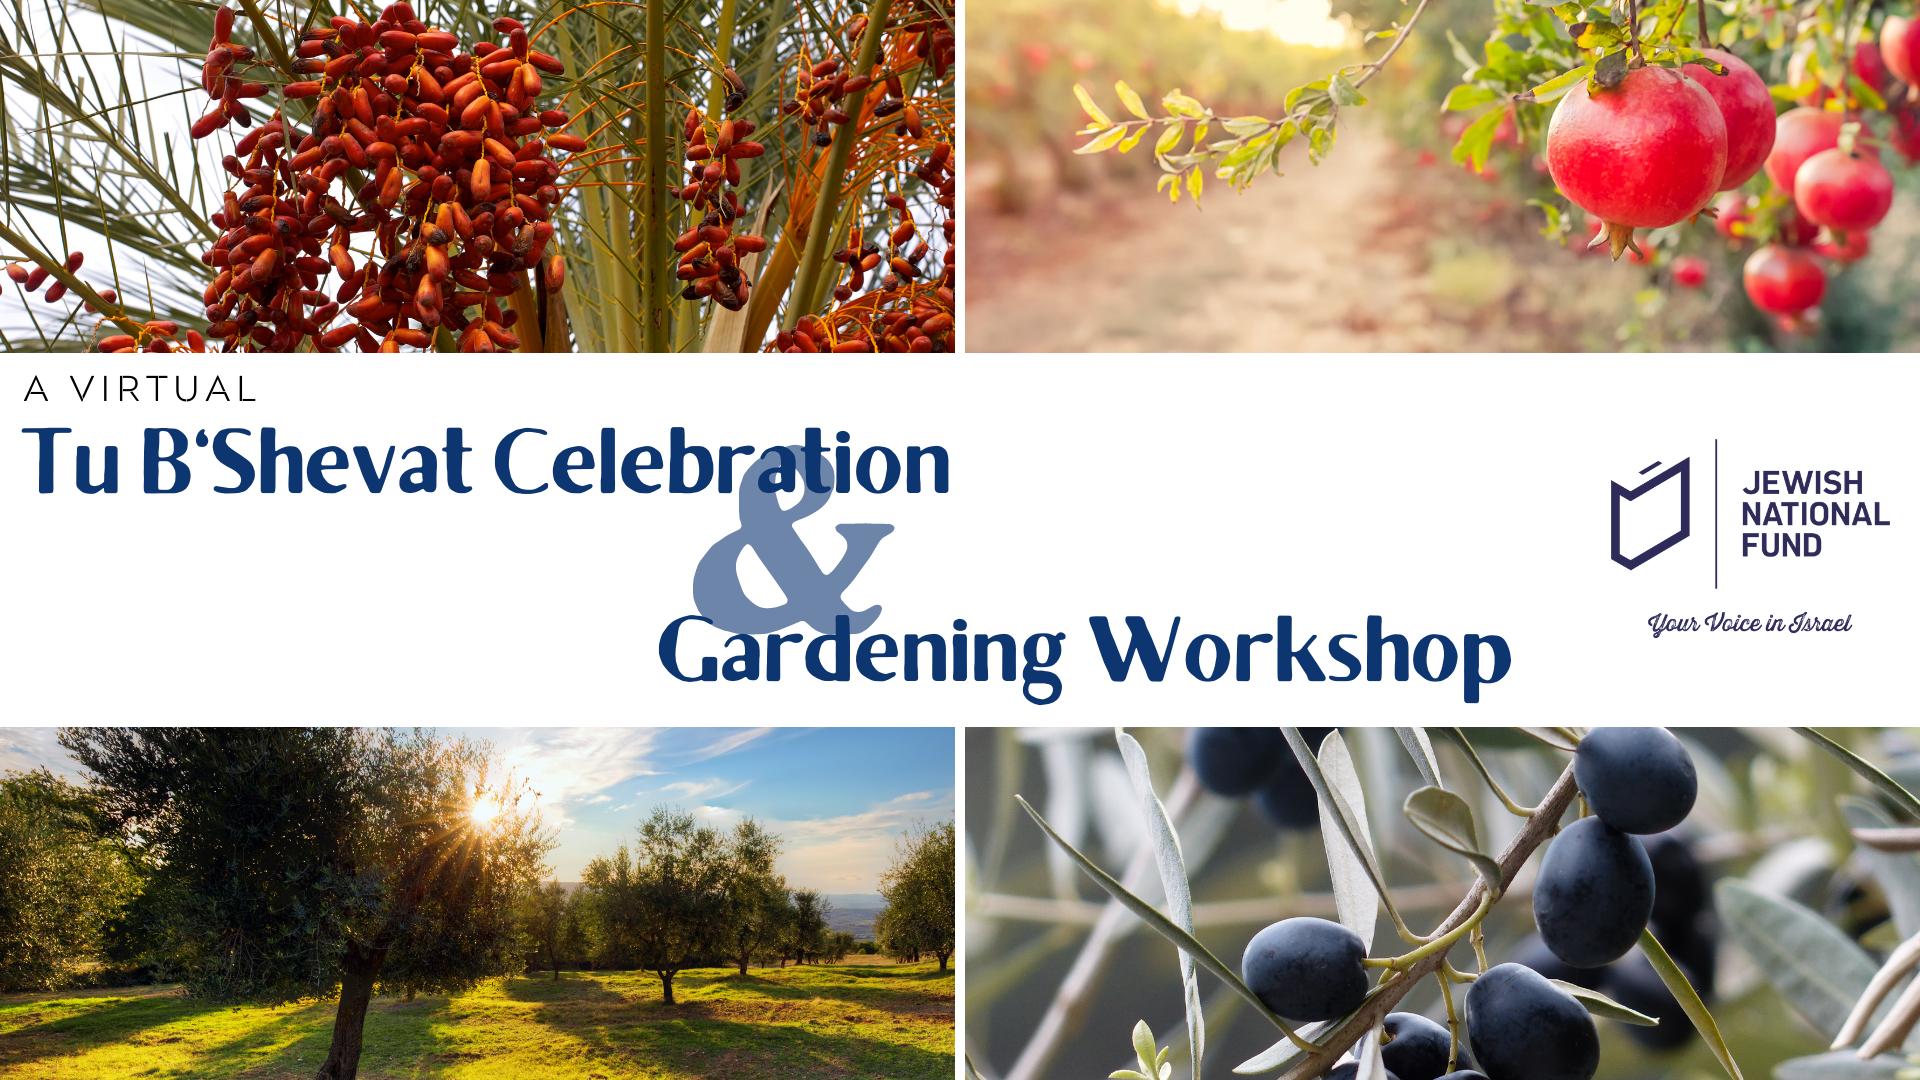 Banner Image for JNF: Tu B'Shevat Virtual Celebration & Gardening Workshop